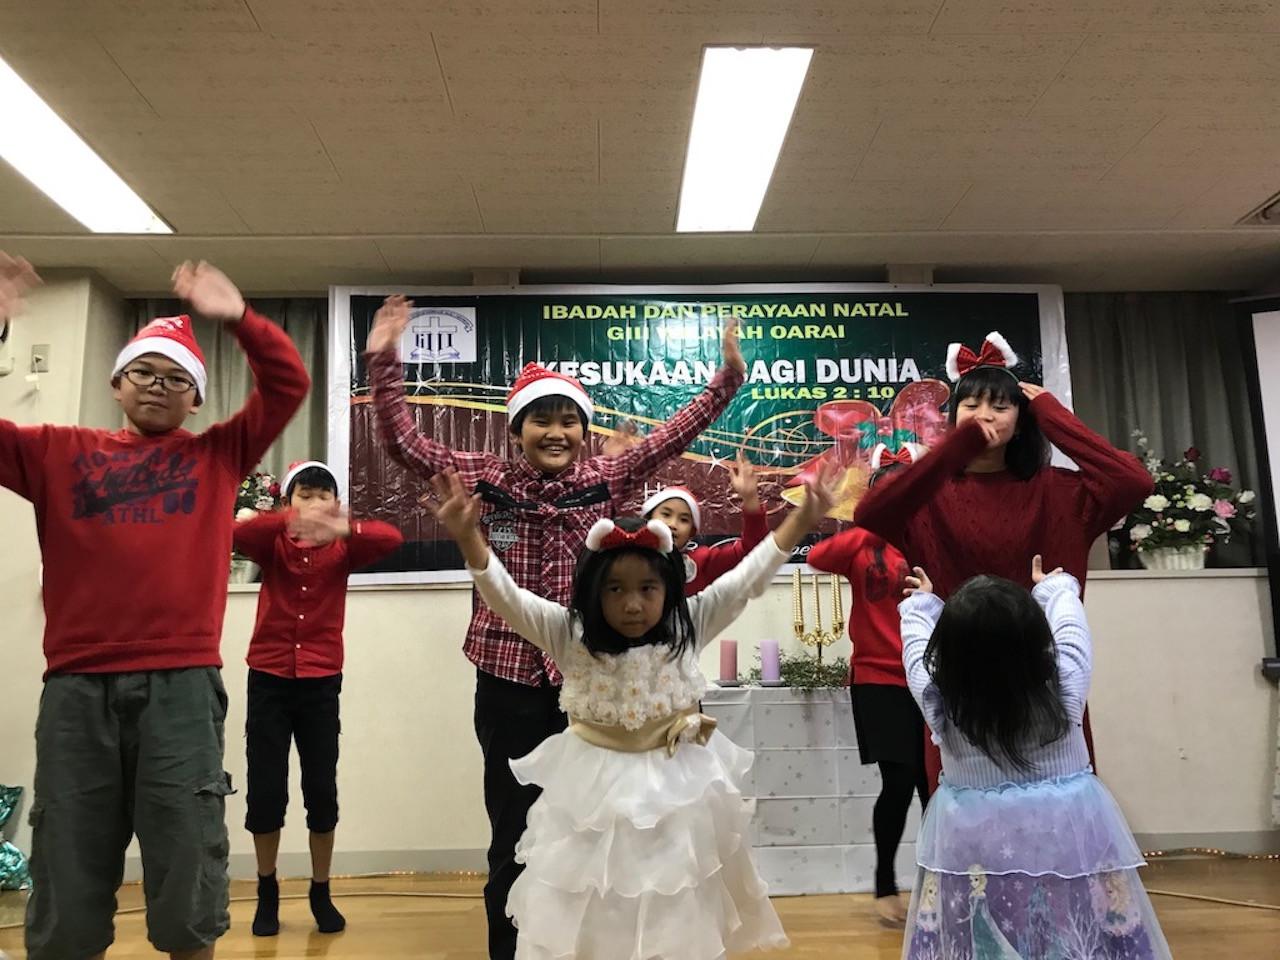 Generations of struggle and aspirations in Japan's kampung Manado